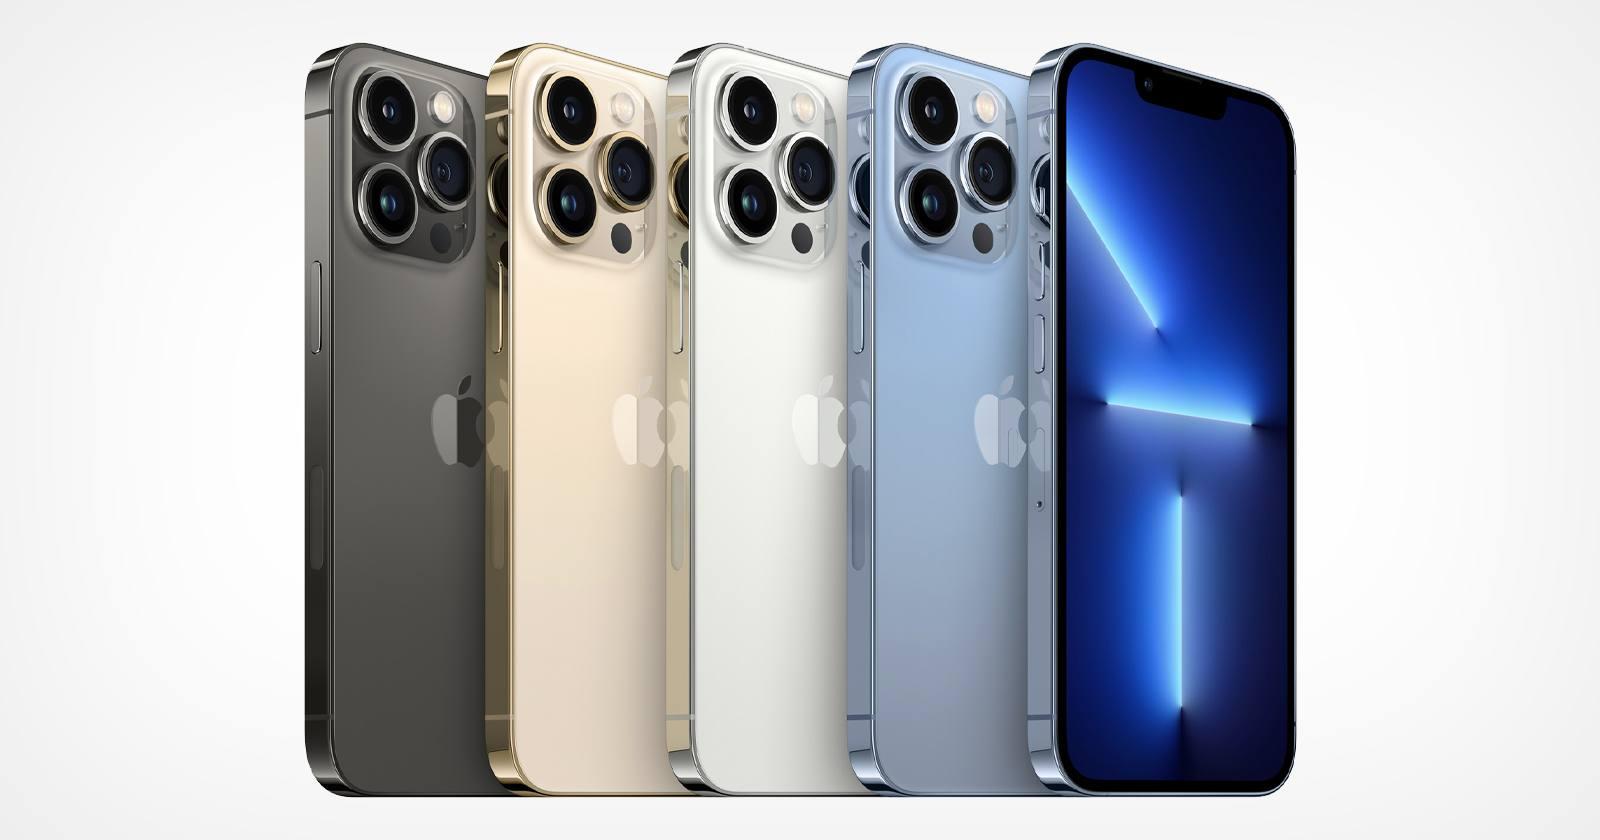 iPhone 13 Pro & iPhone 13 Pro Max (apple.com)